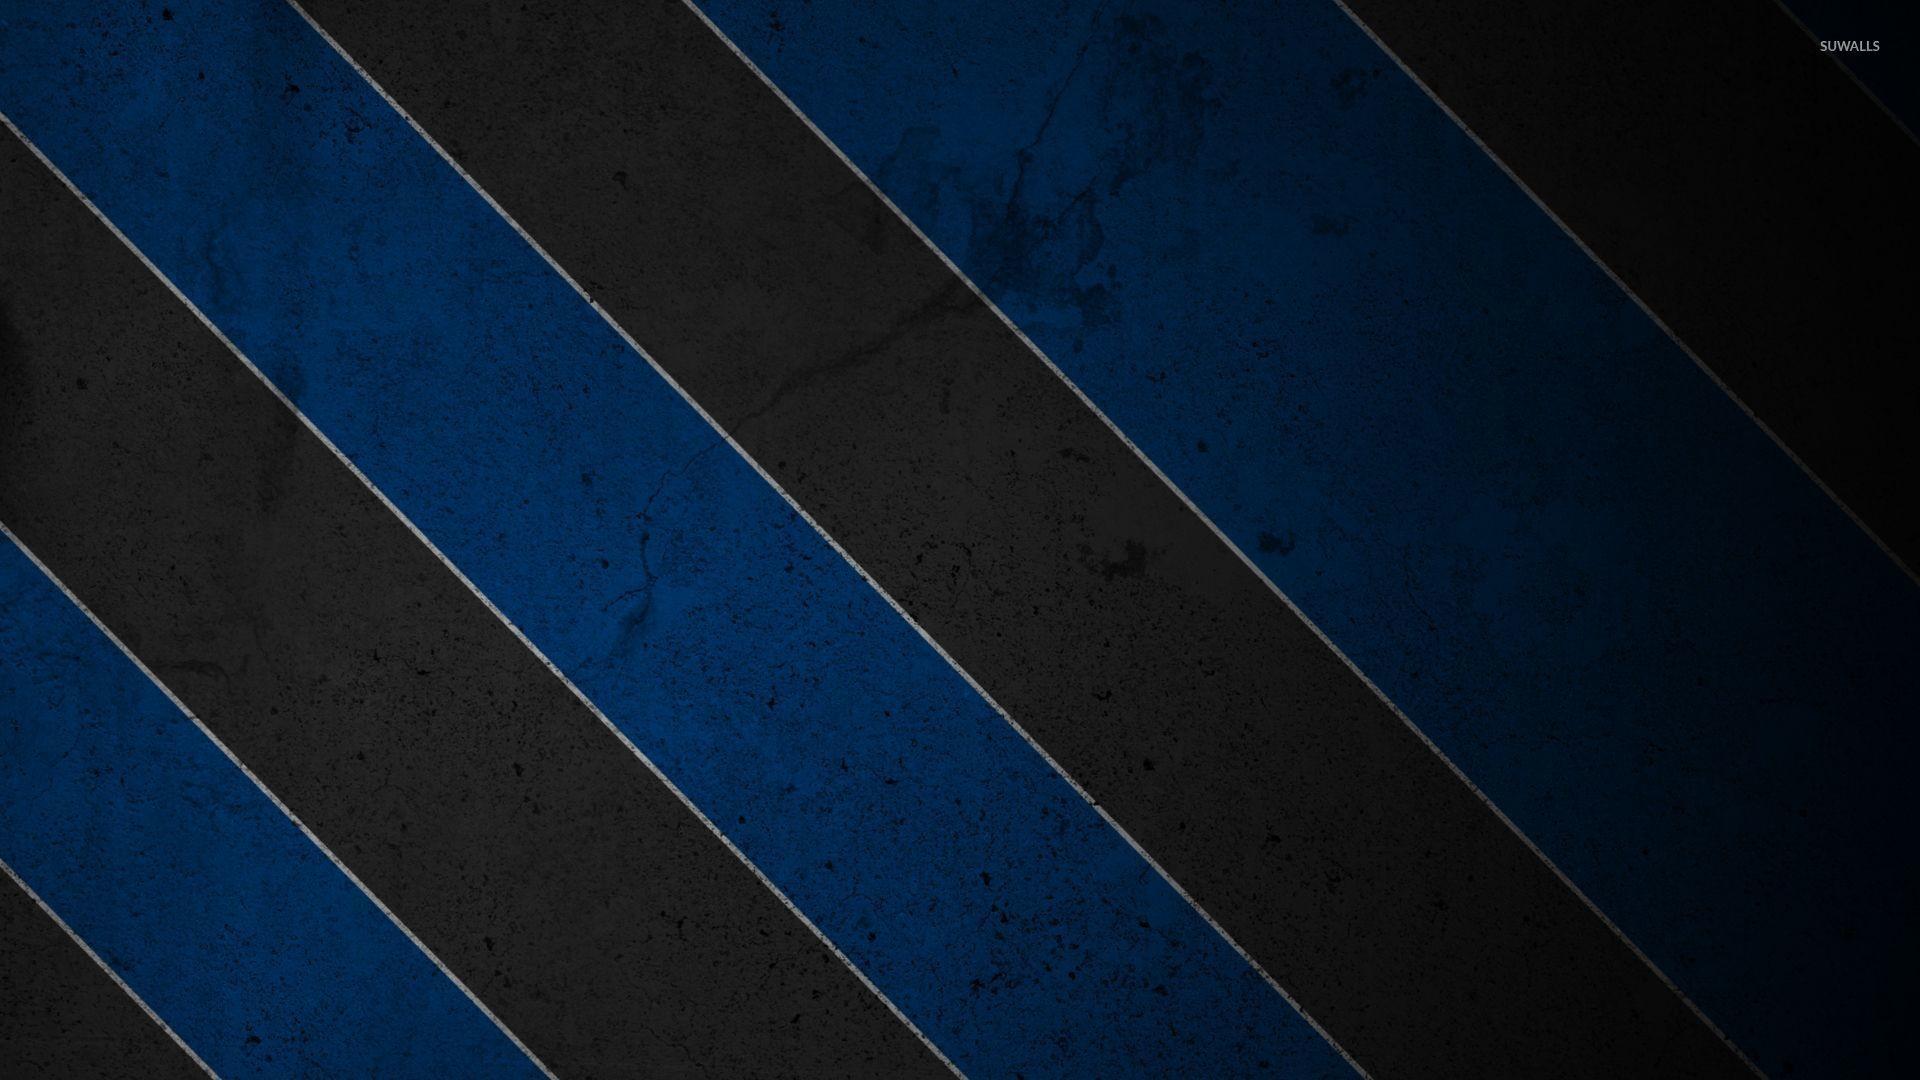 Texturized black and blue stripes wallpaper jpg